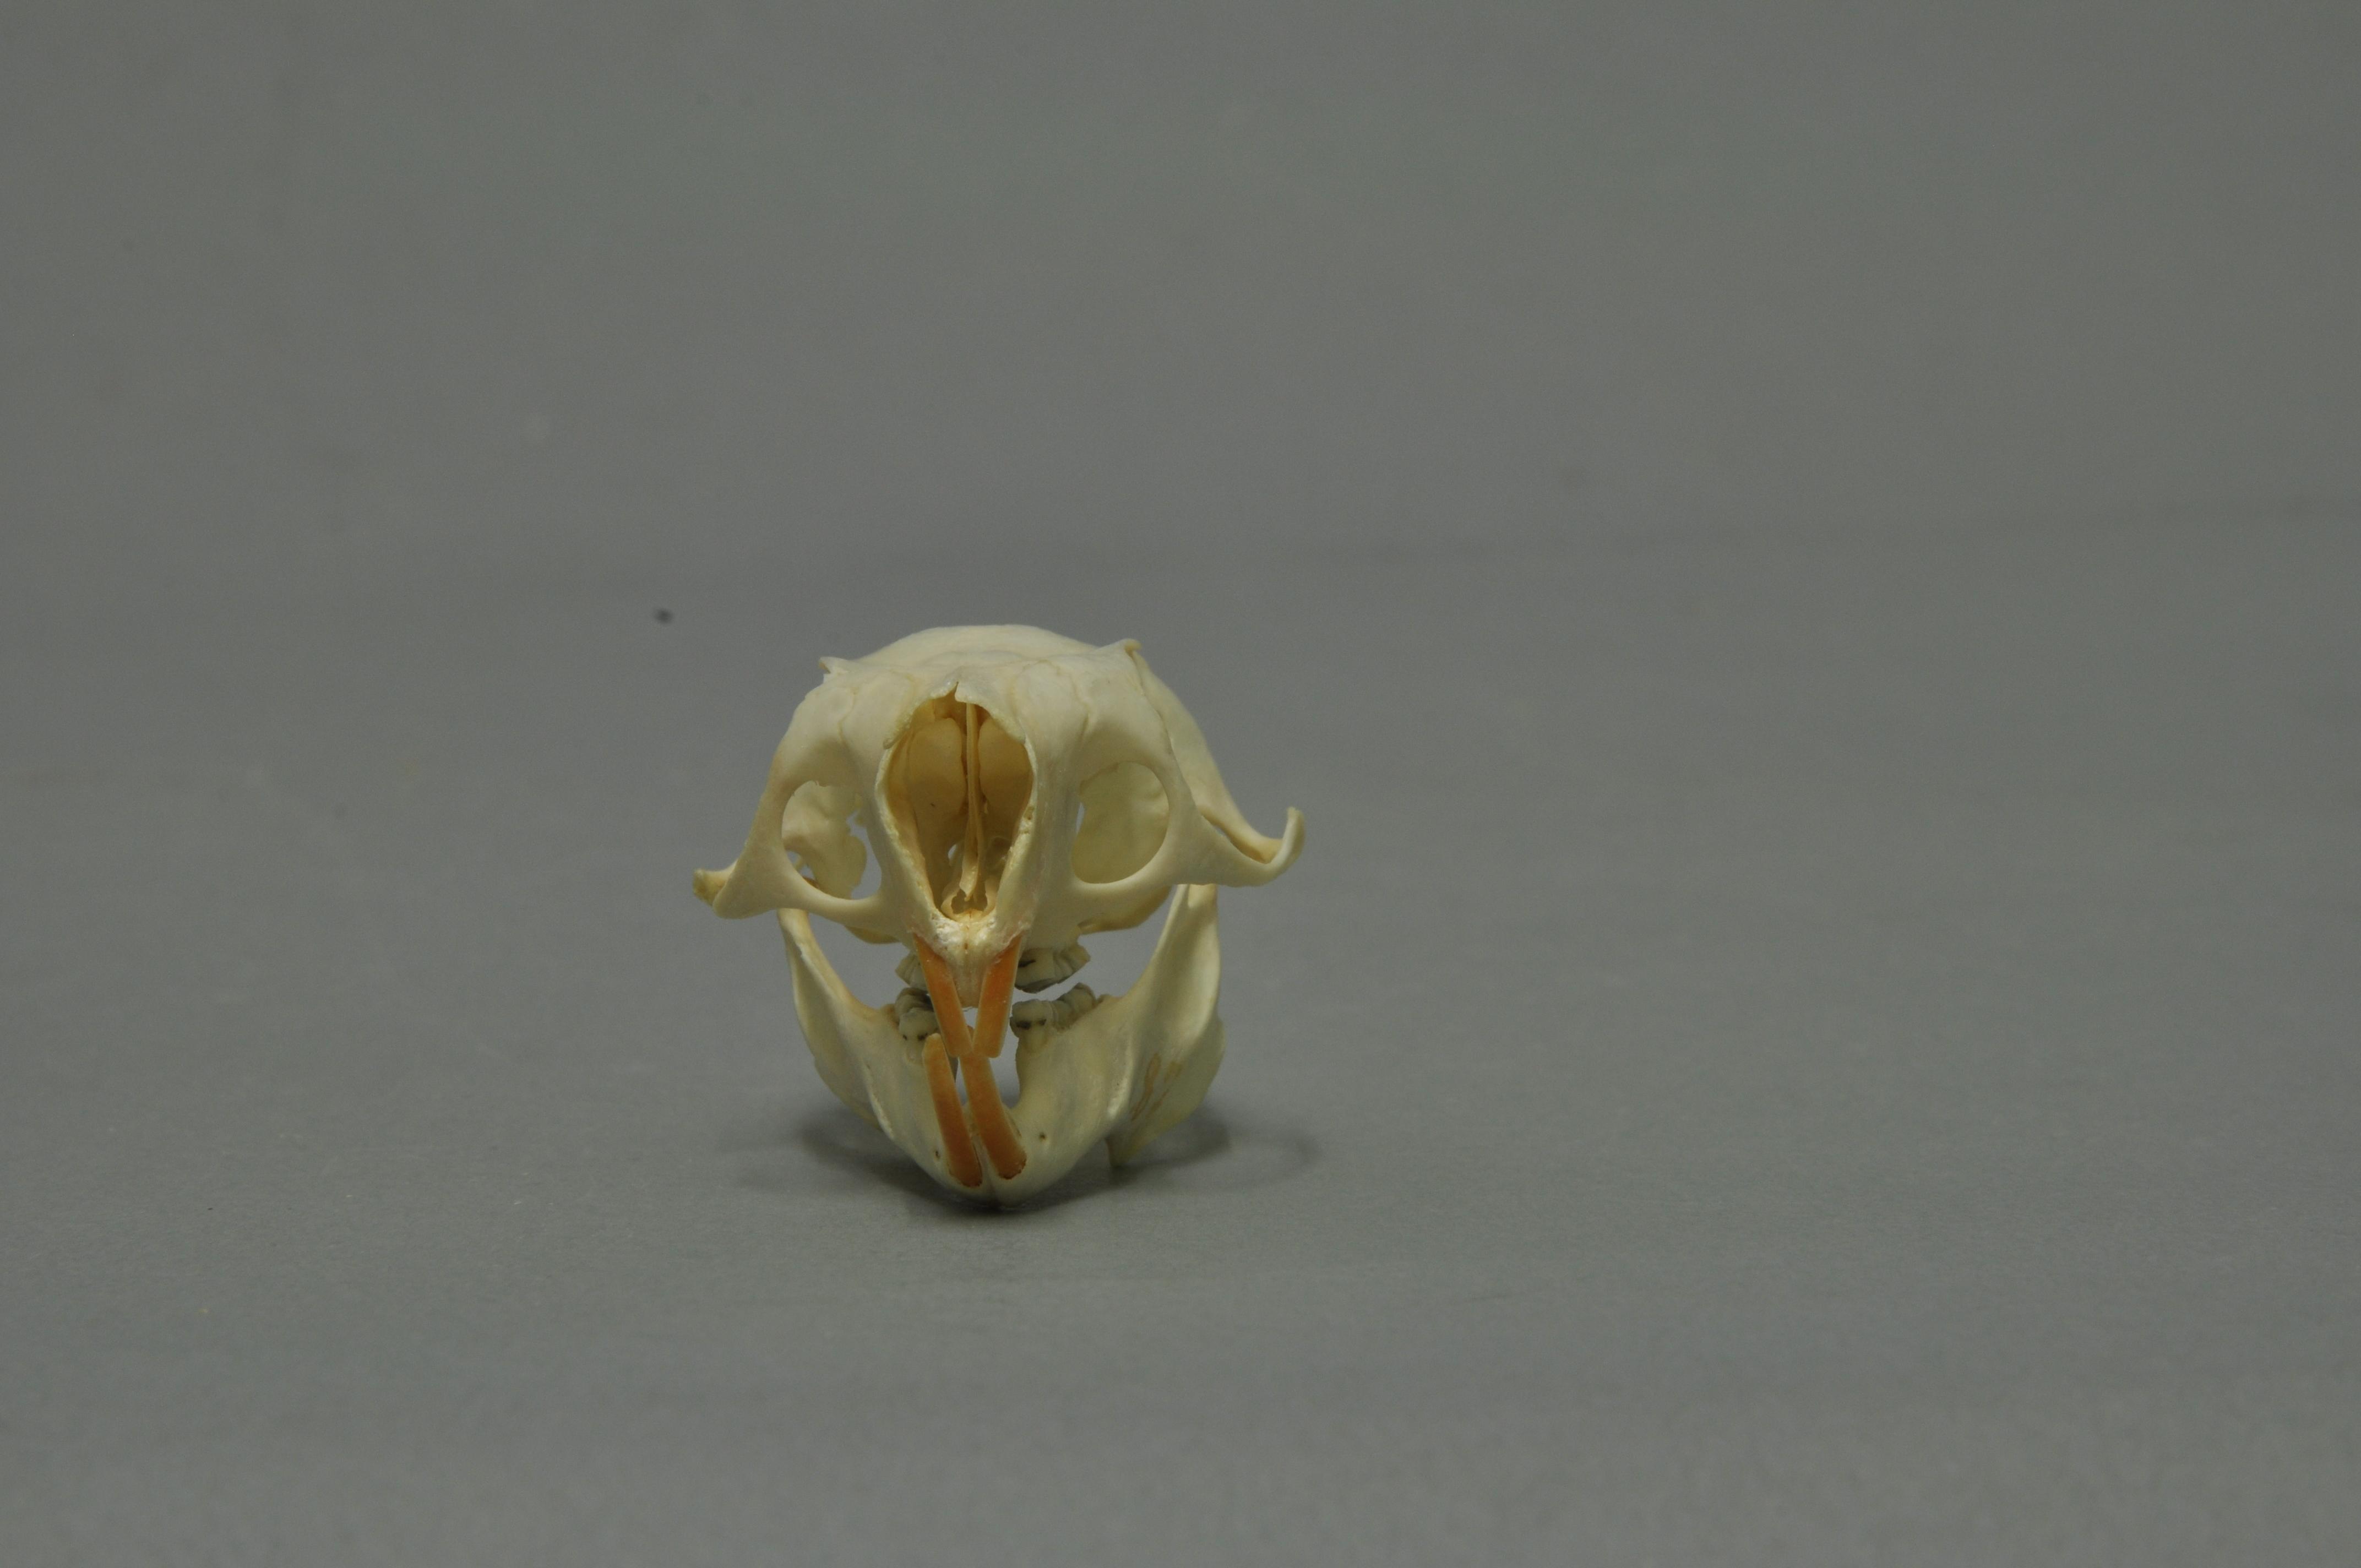 Image of Beecroft's Flying Squirrel